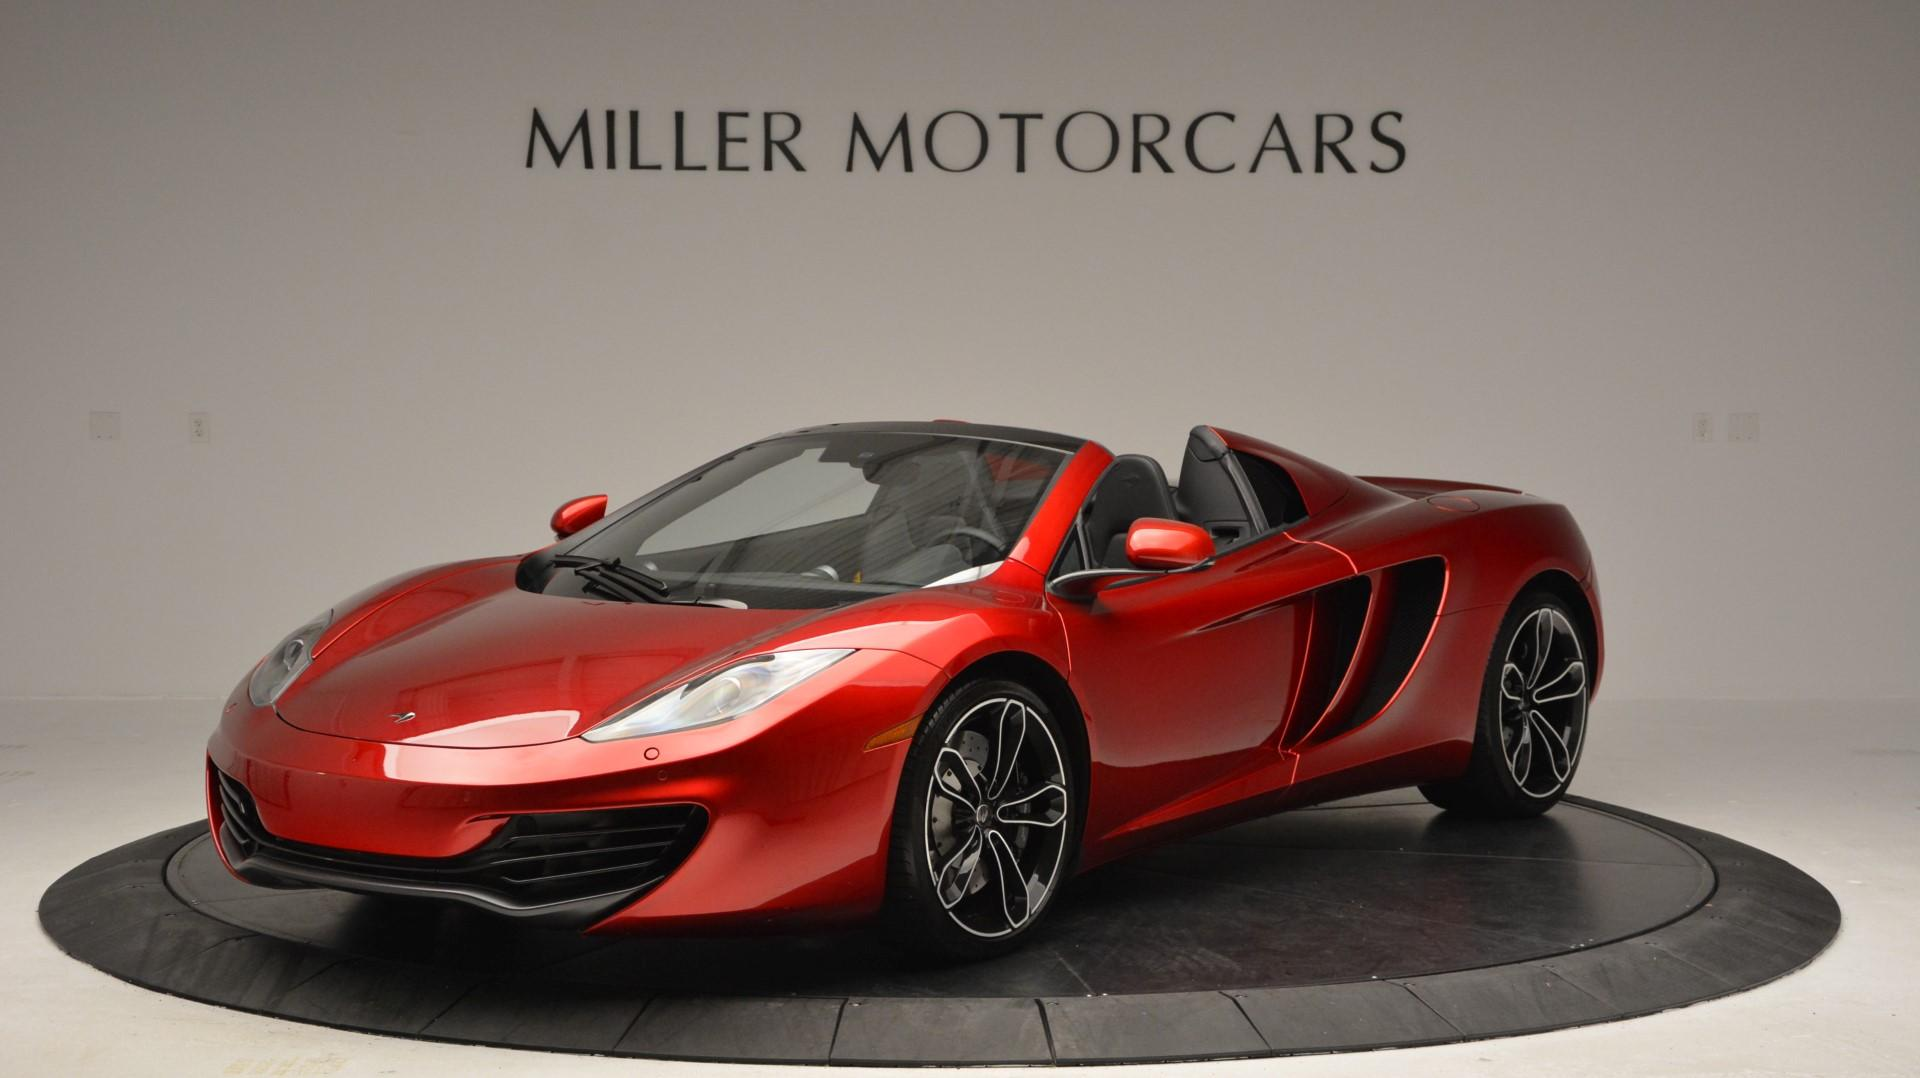 Used 2013 McLaren 12C Spider for sale Sold at Alfa Romeo of Westport in Westport CT 06880 1